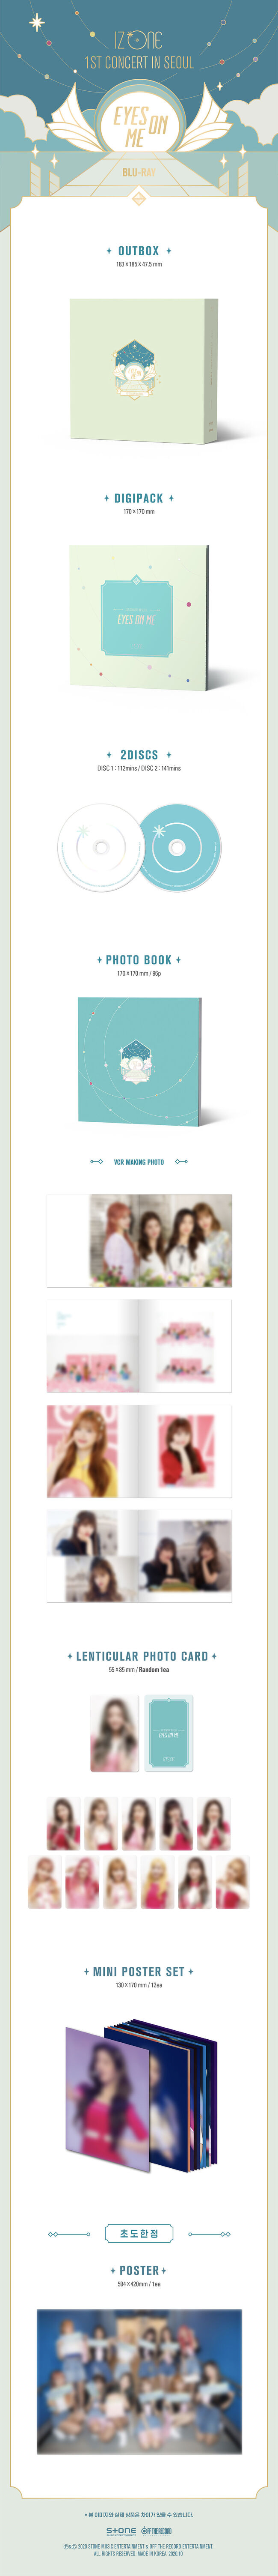 EOM Seoul Blu-ray Preview.jpg